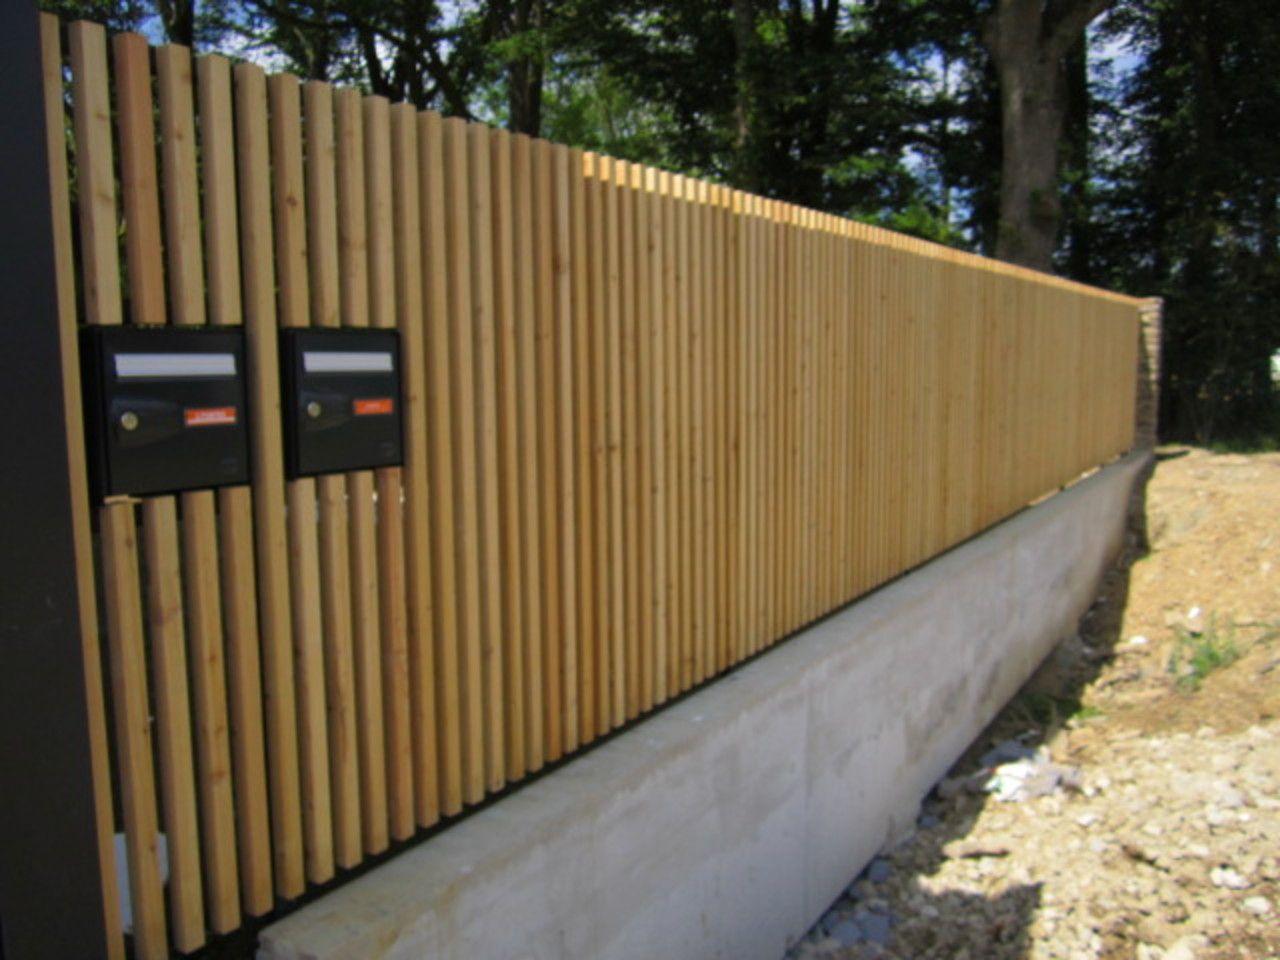 afficher l 39 image d 39 origine cl ture pinterest cloture bois bois et cloture jardin. Black Bedroom Furniture Sets. Home Design Ideas